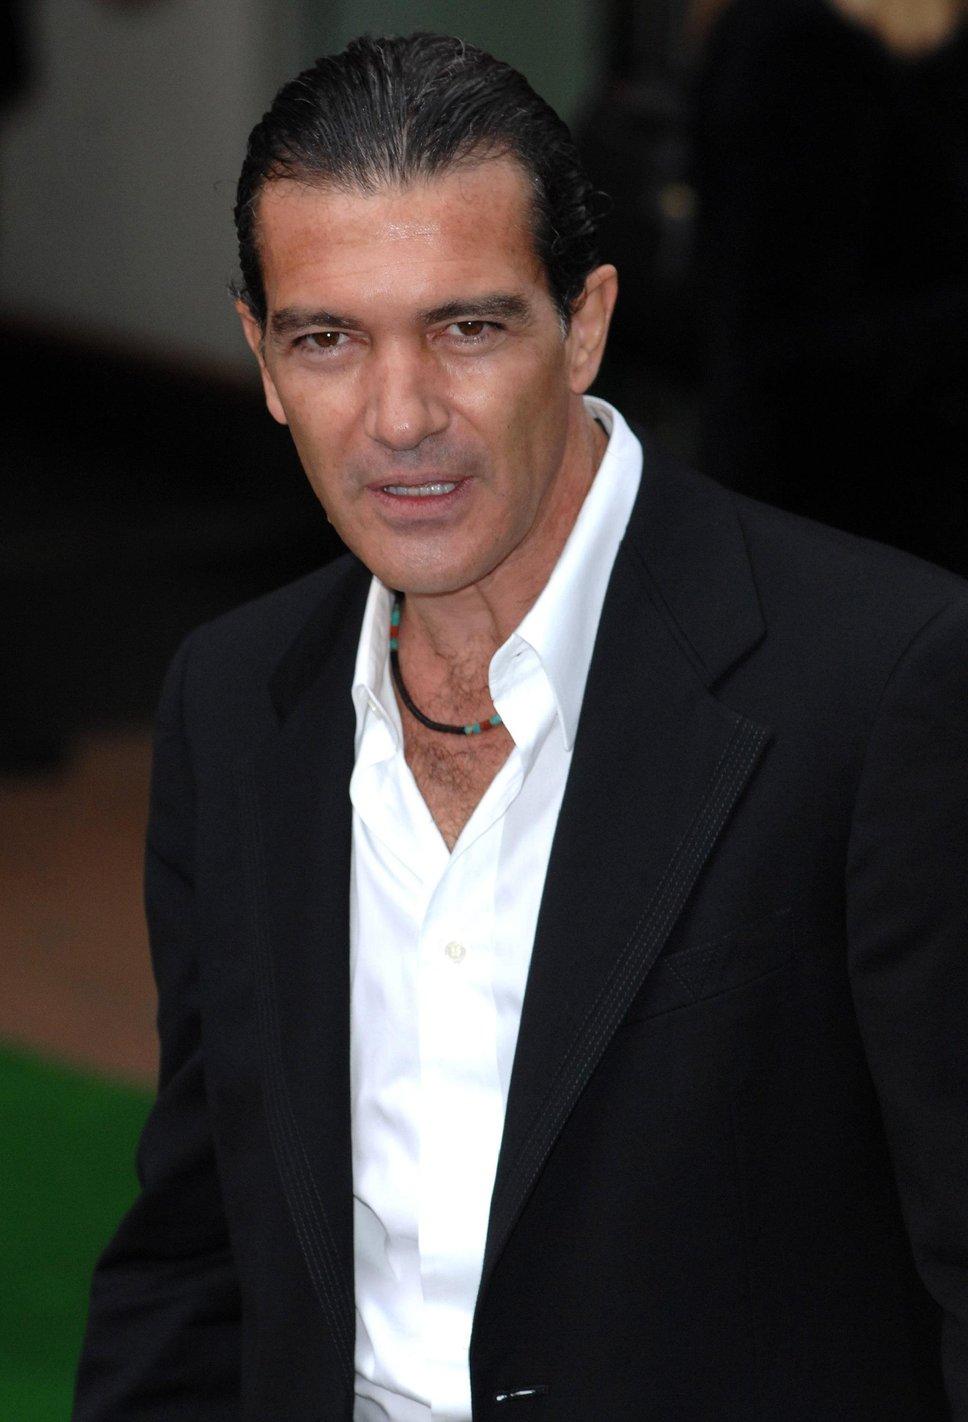 Antonio banderas white shirt b Antonio Banderas